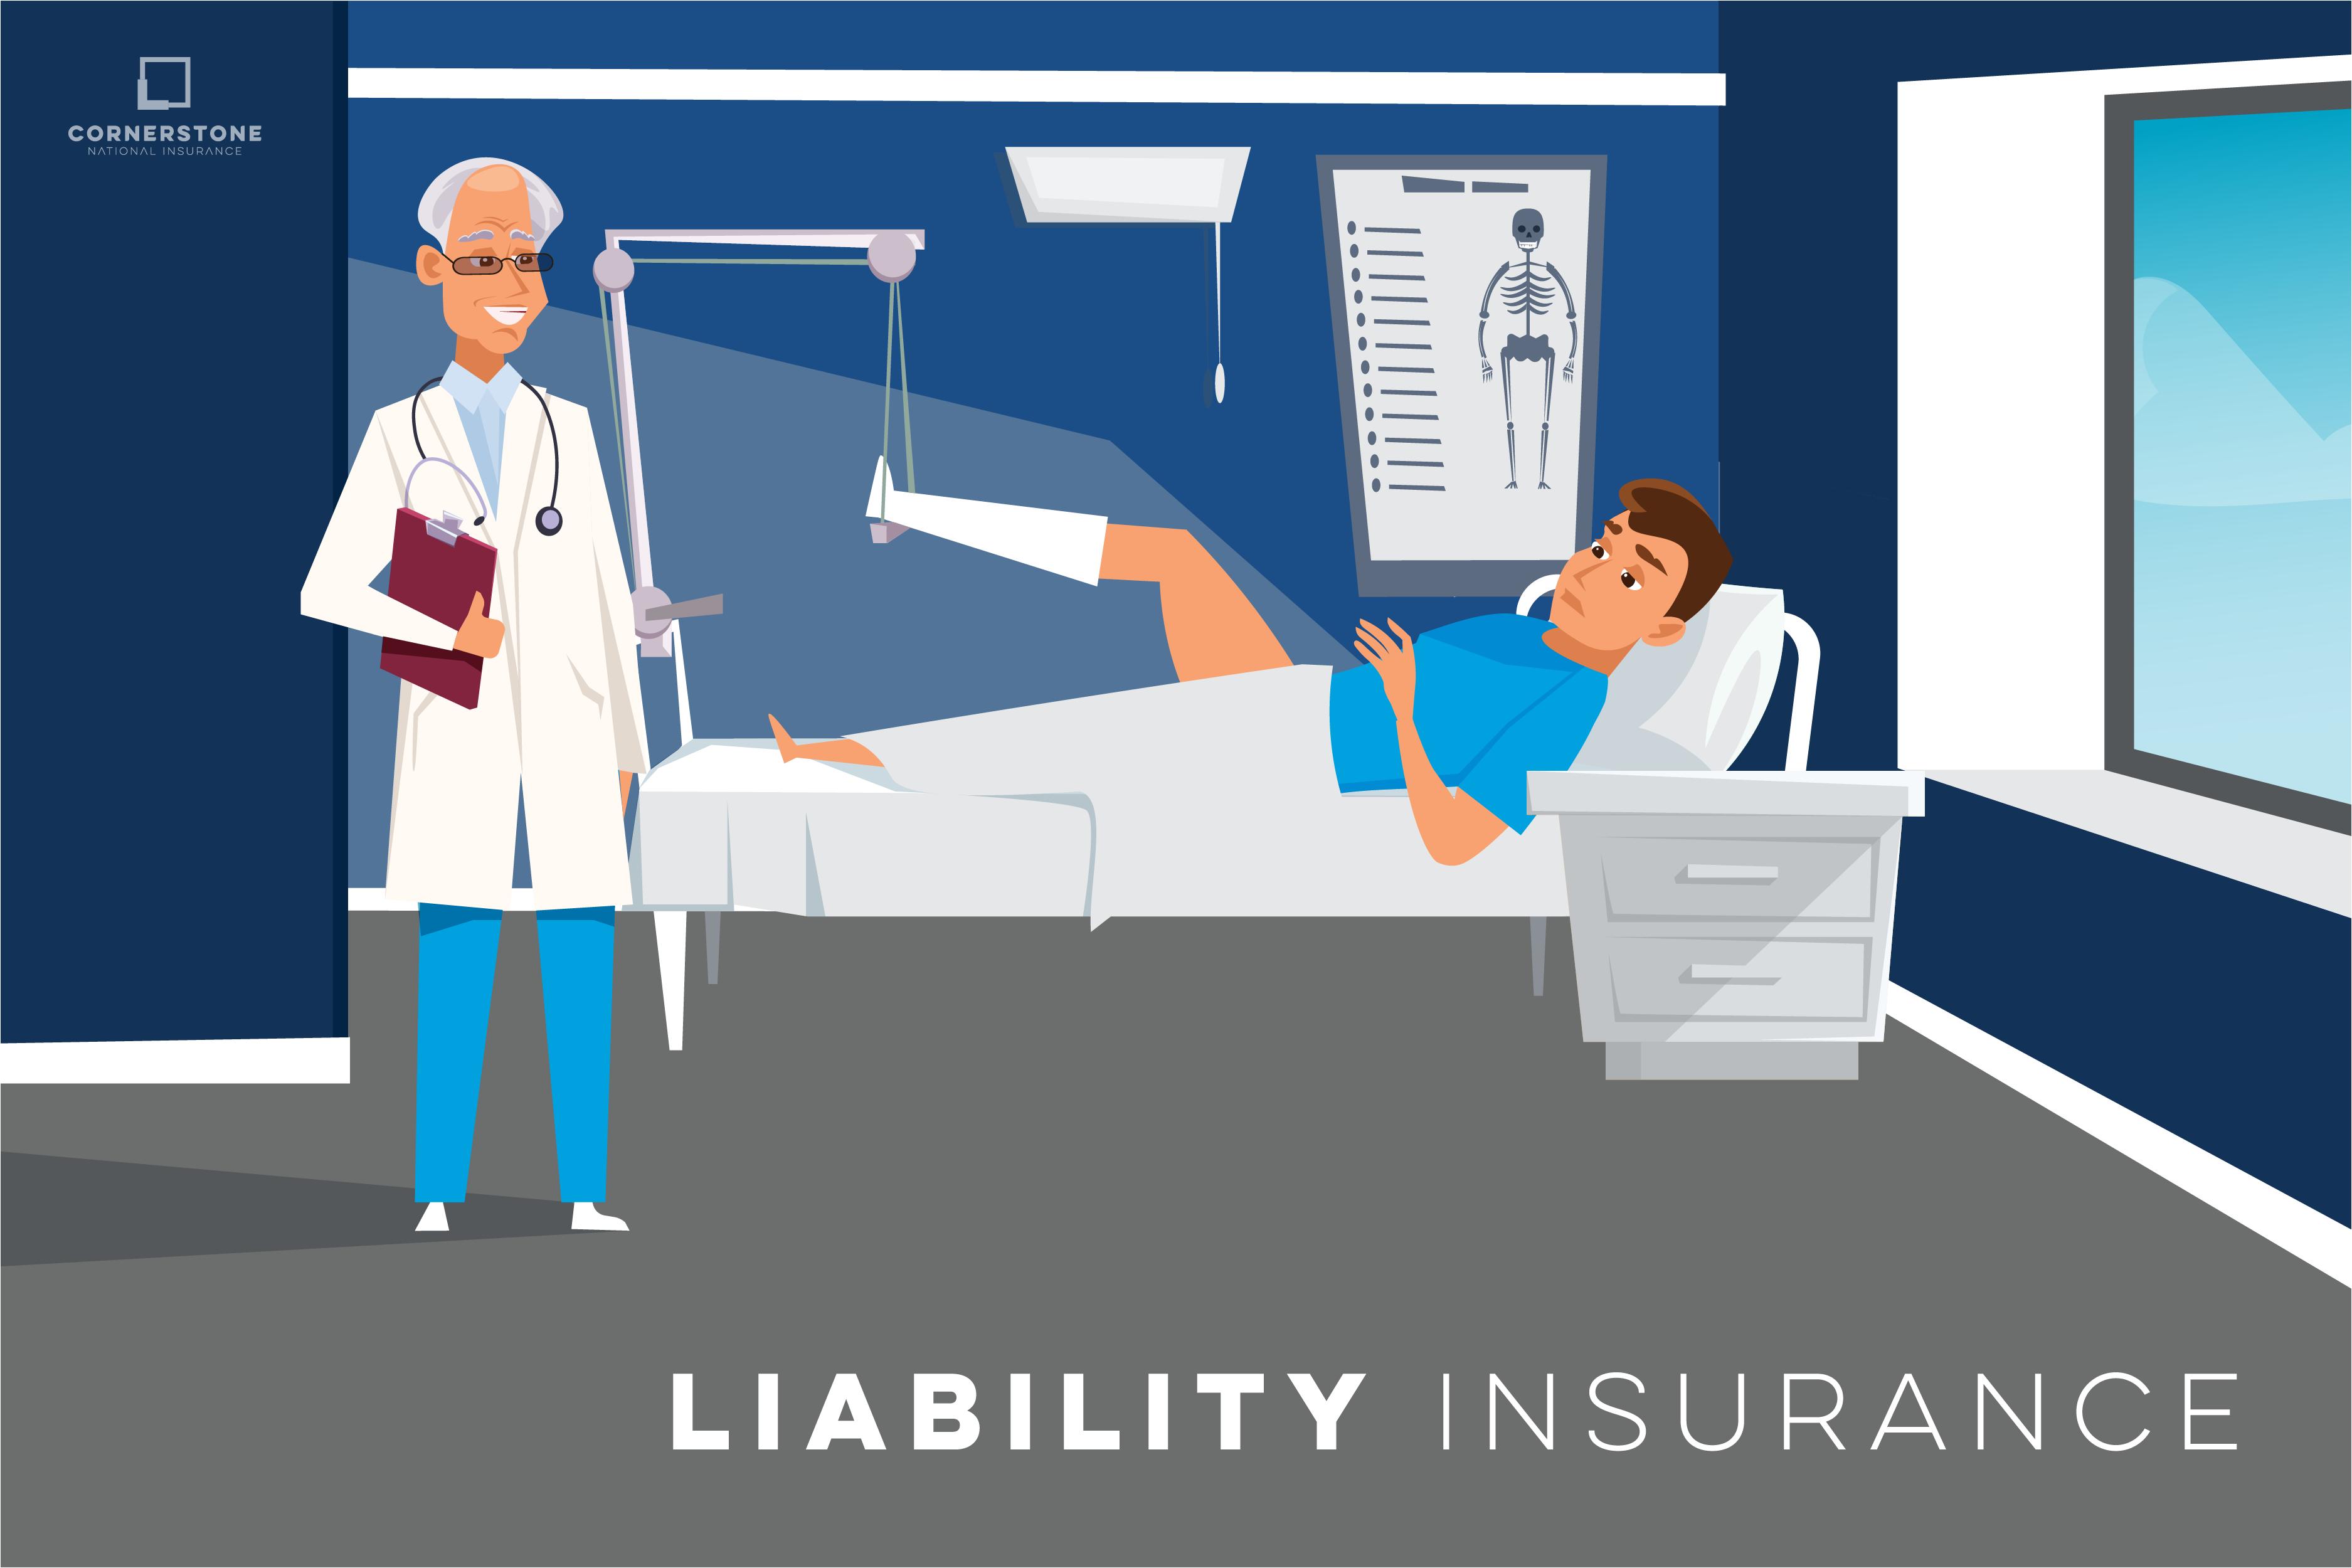 4. CNI_Liability_Blog_Title-01